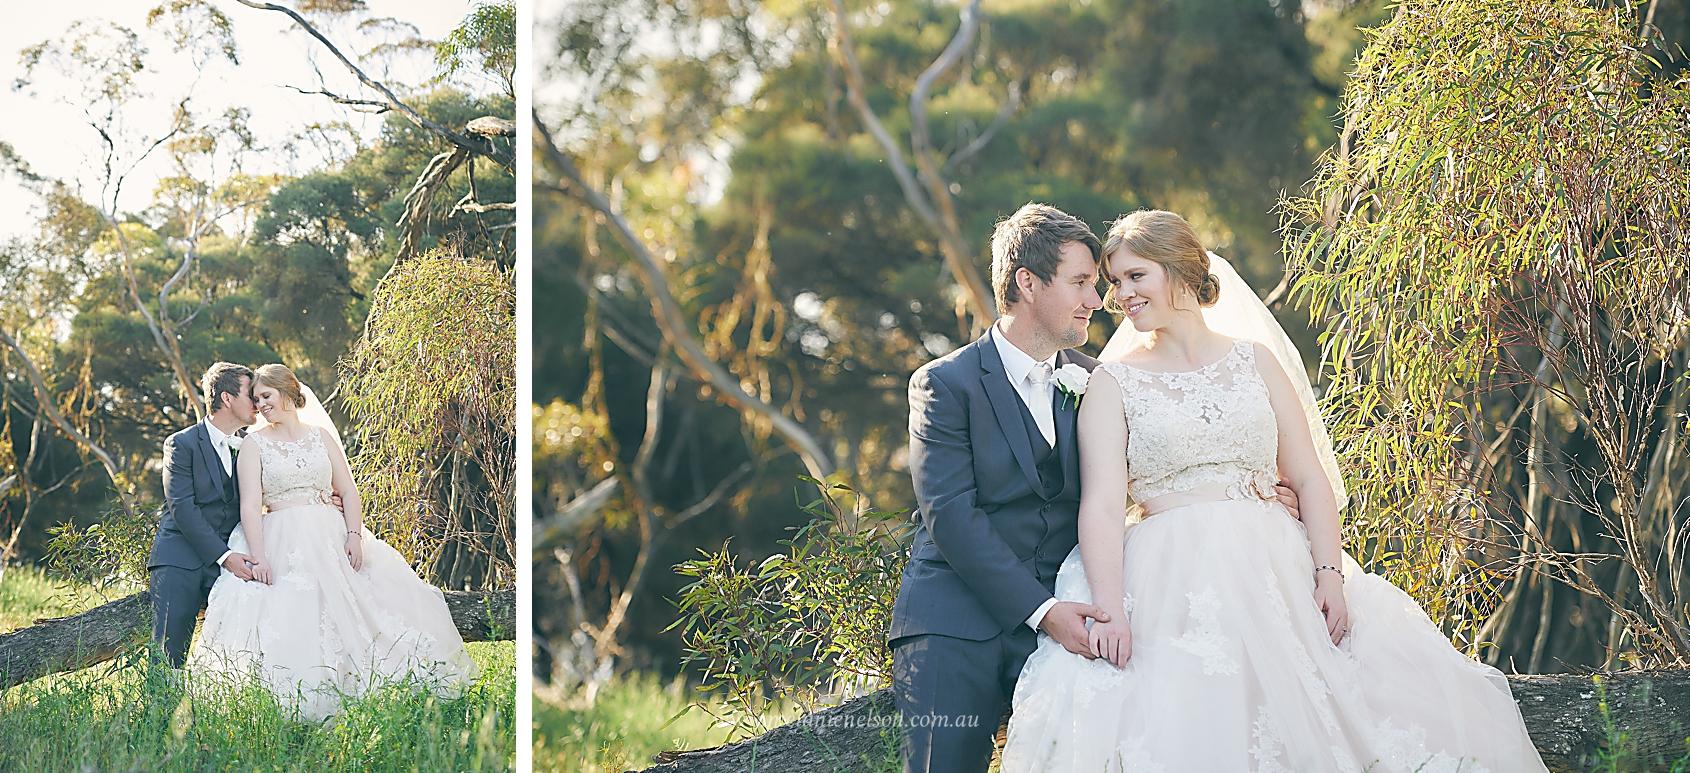 yorke_peninsula_wedding_photographer_0071.jpg